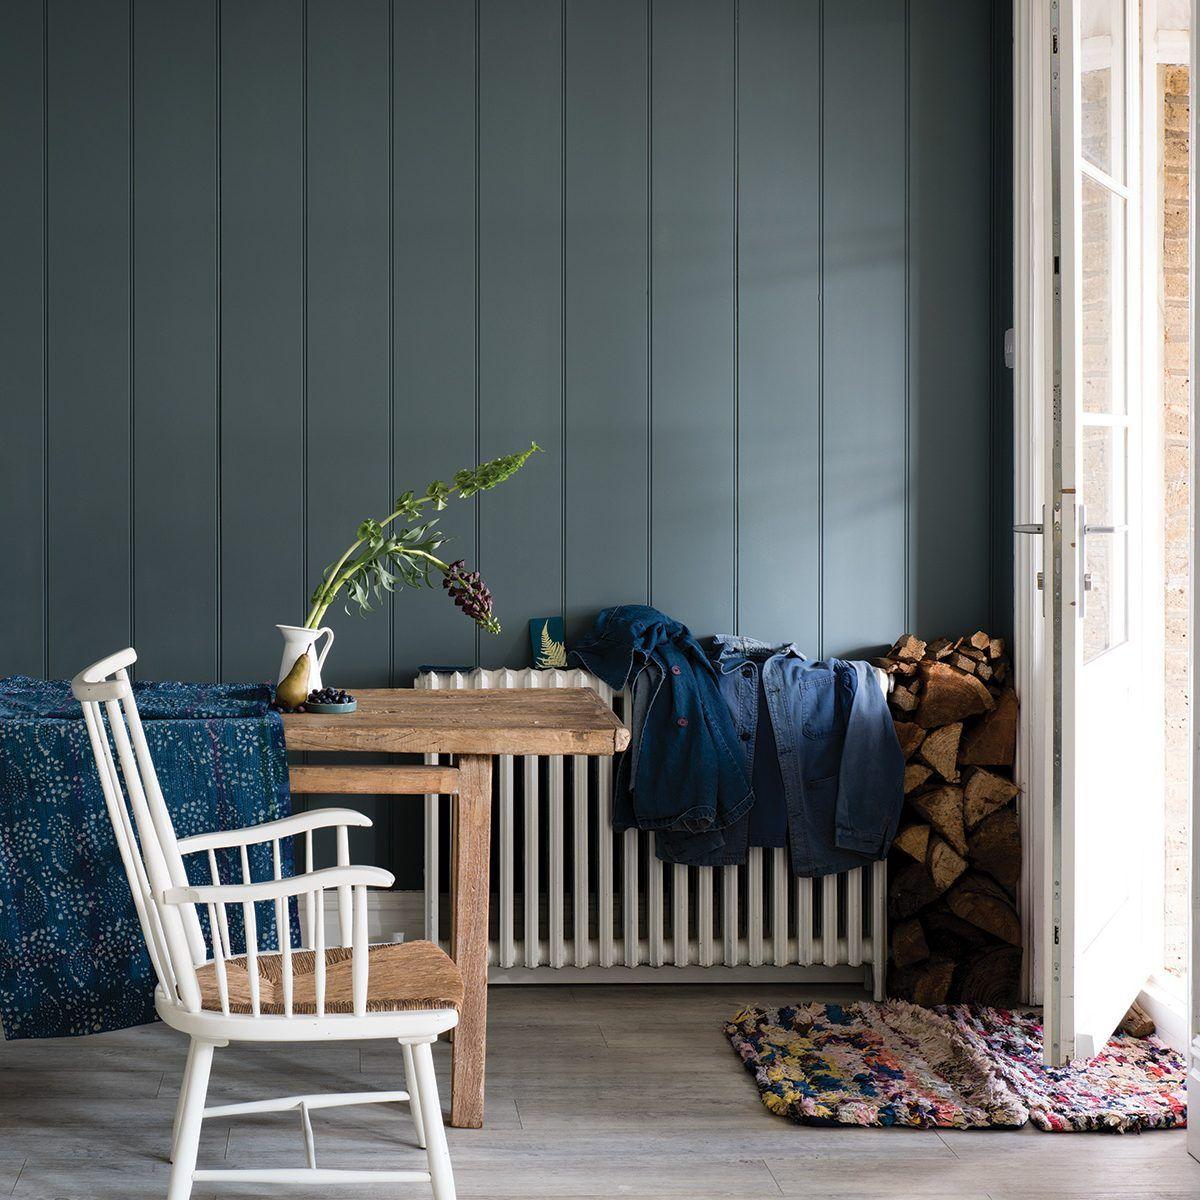 The best Farrow & Ball blue paint – to create a brilliant blue room scheme